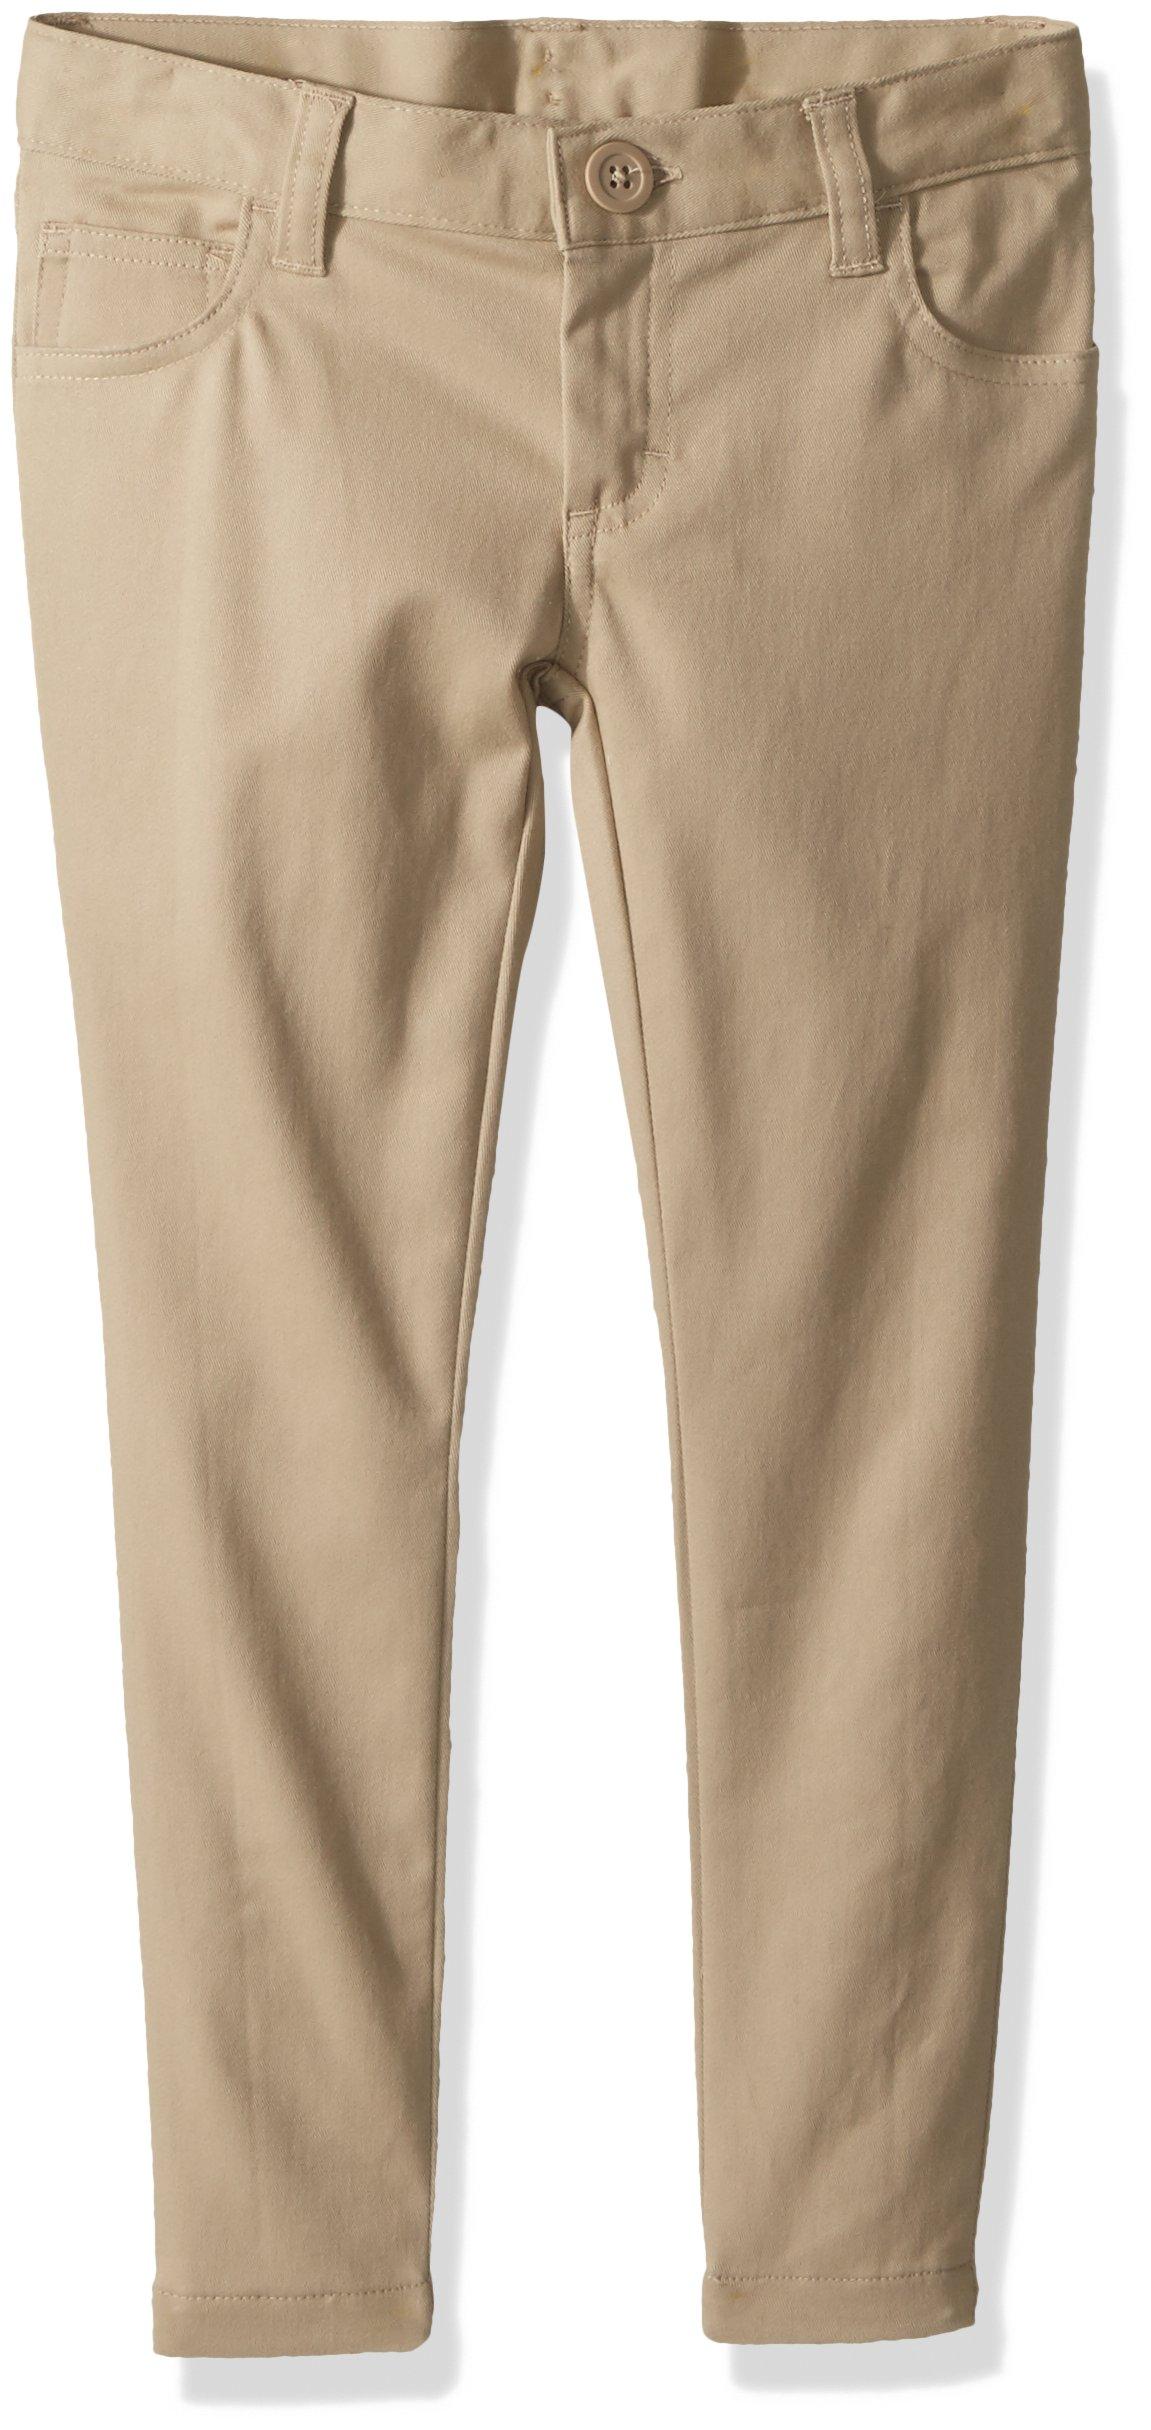 Classroom Uniforms Big Girls' 5 Pocket Stretch Skinny Pant, Khaki, 8